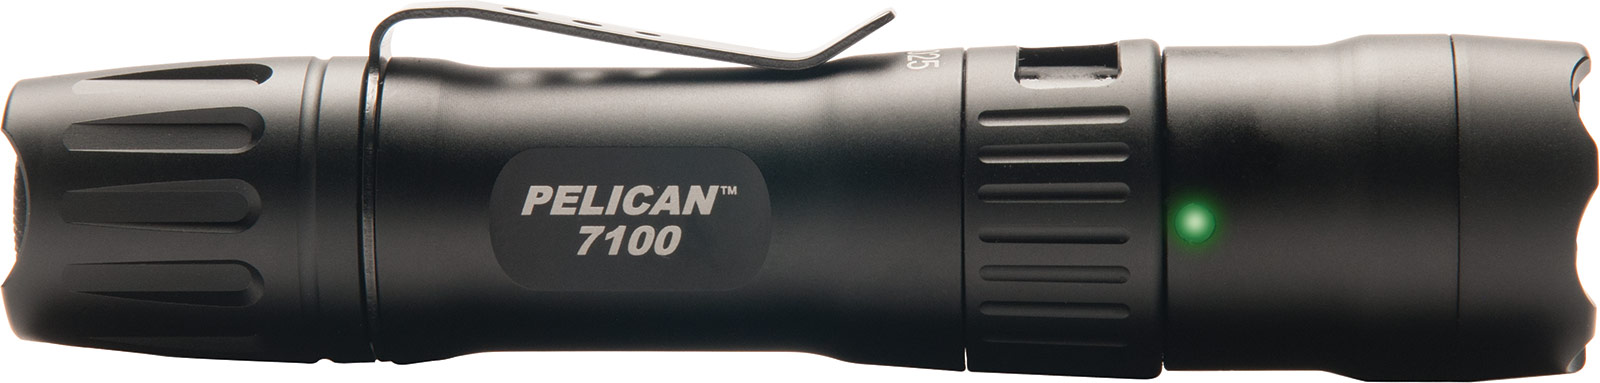 pelican 7100 black usb rechargeable flashlight